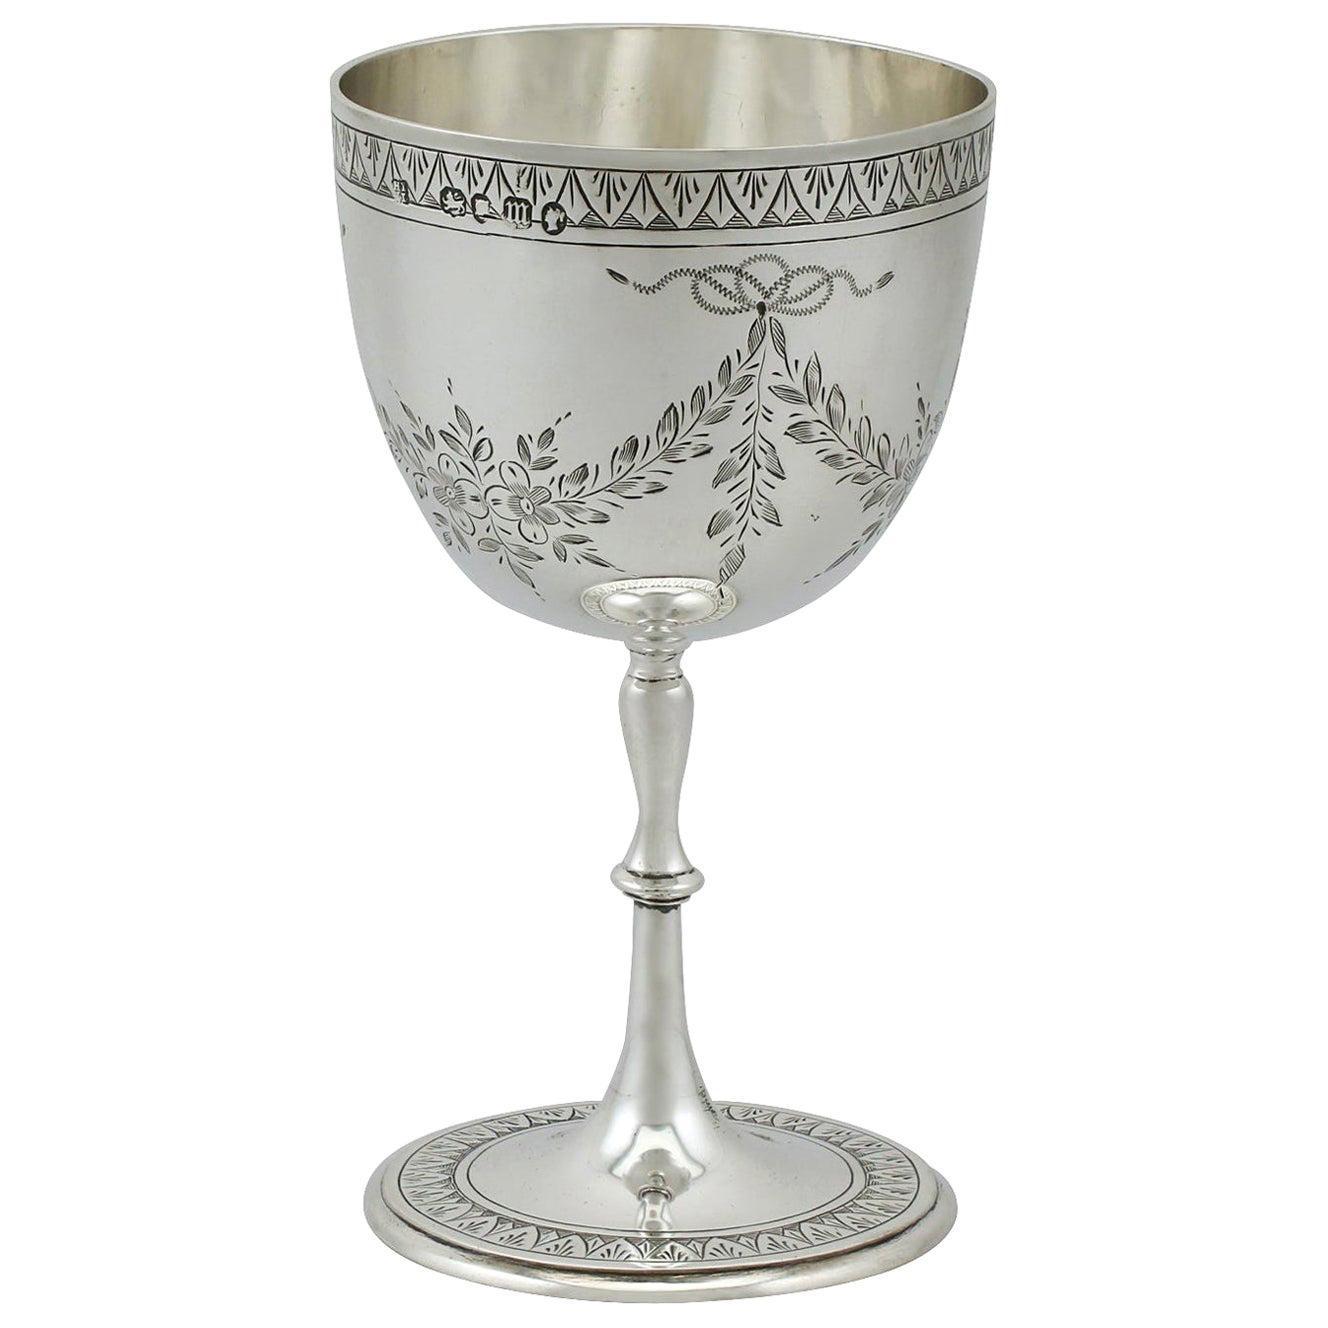 Antique Victorian Sterling Silver Goblet, 1867